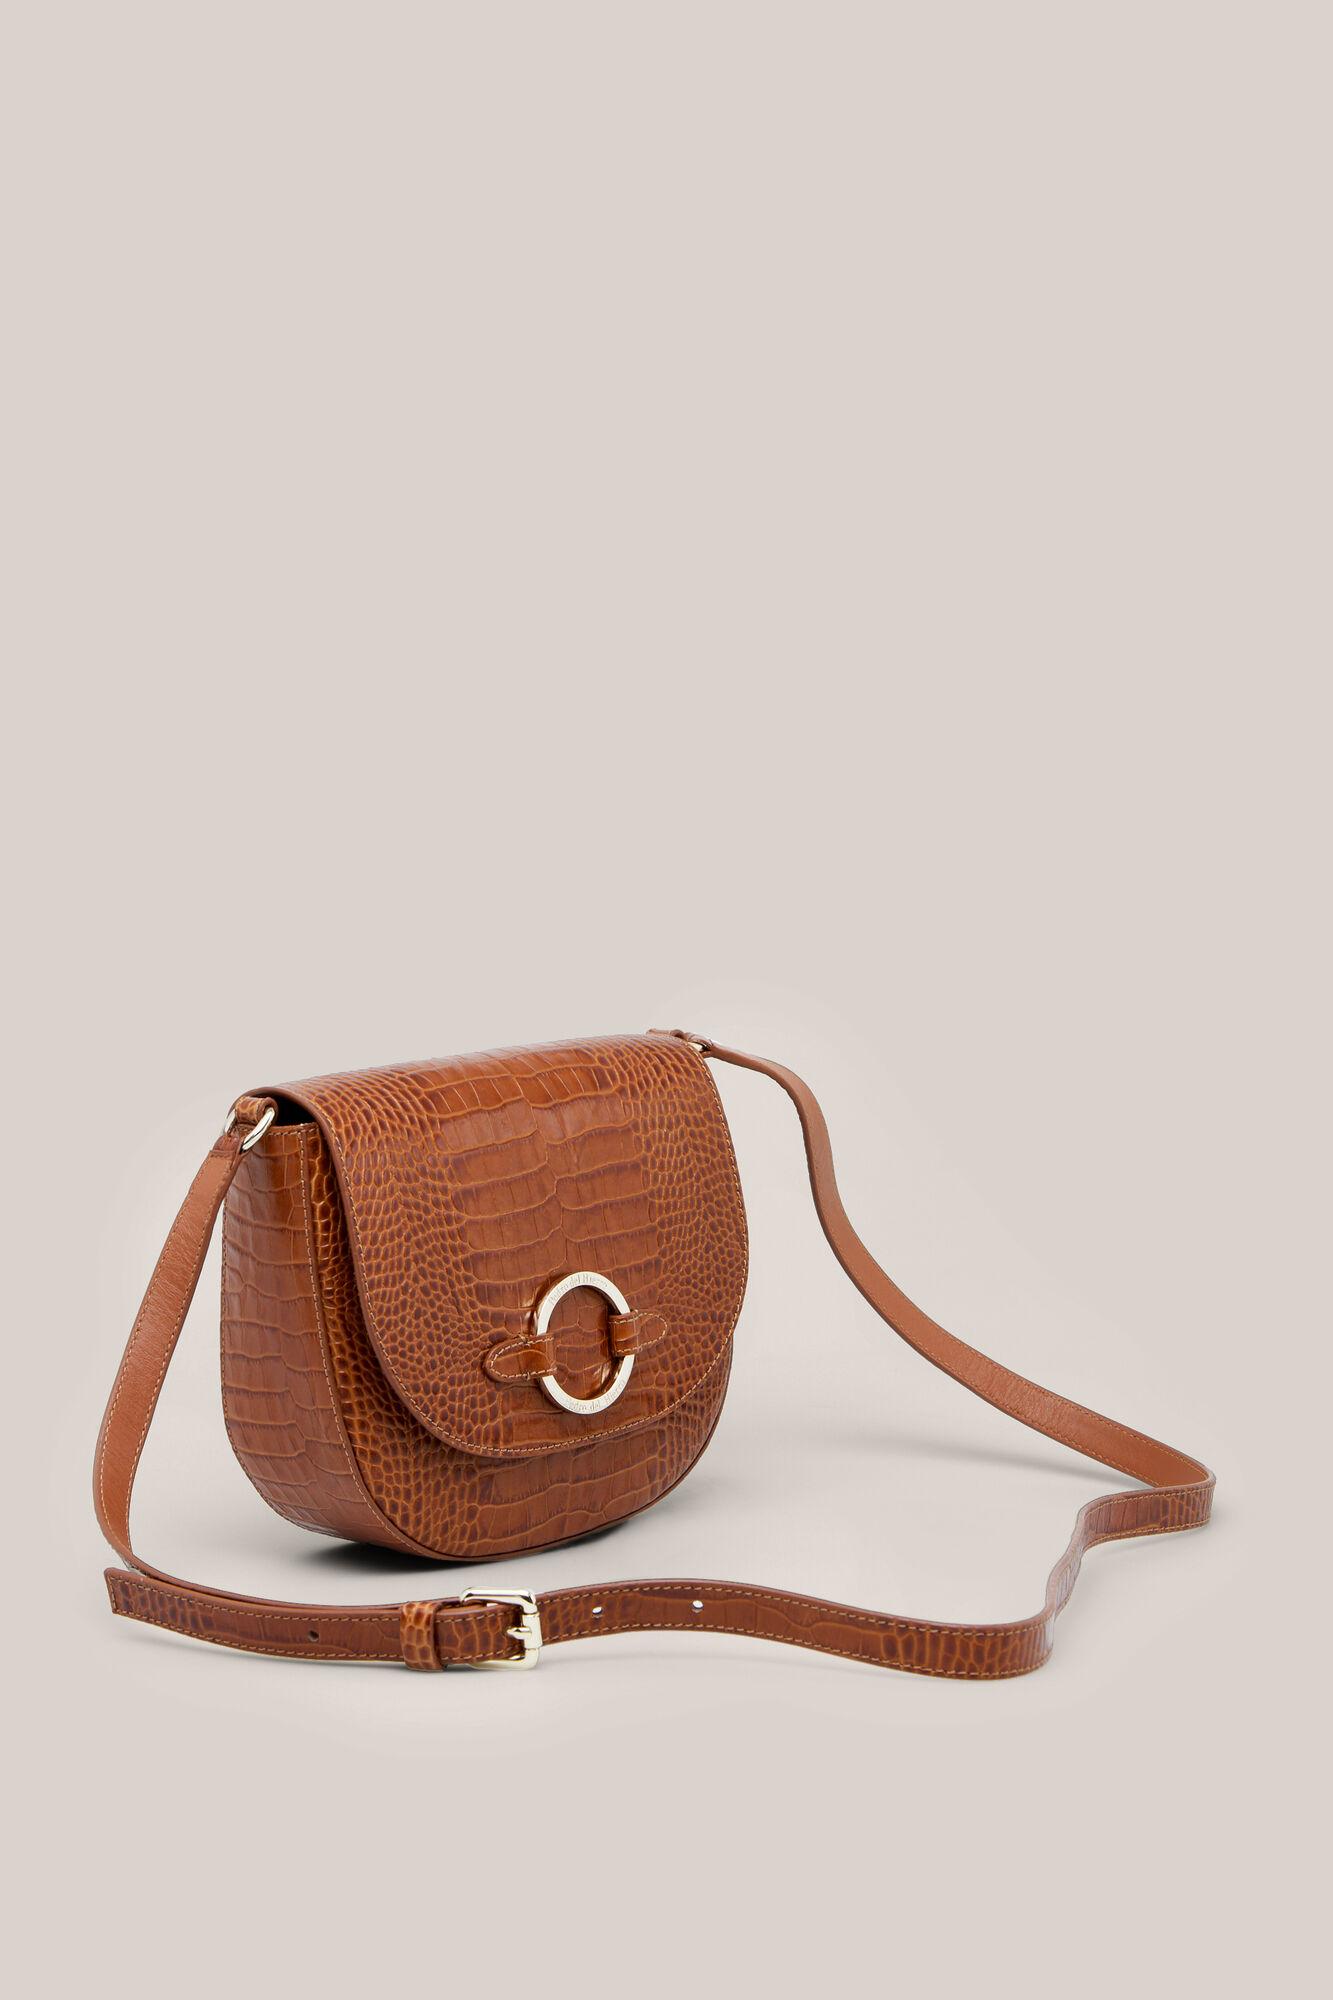 3bace919954 Crocodile effect leather crossbody bag